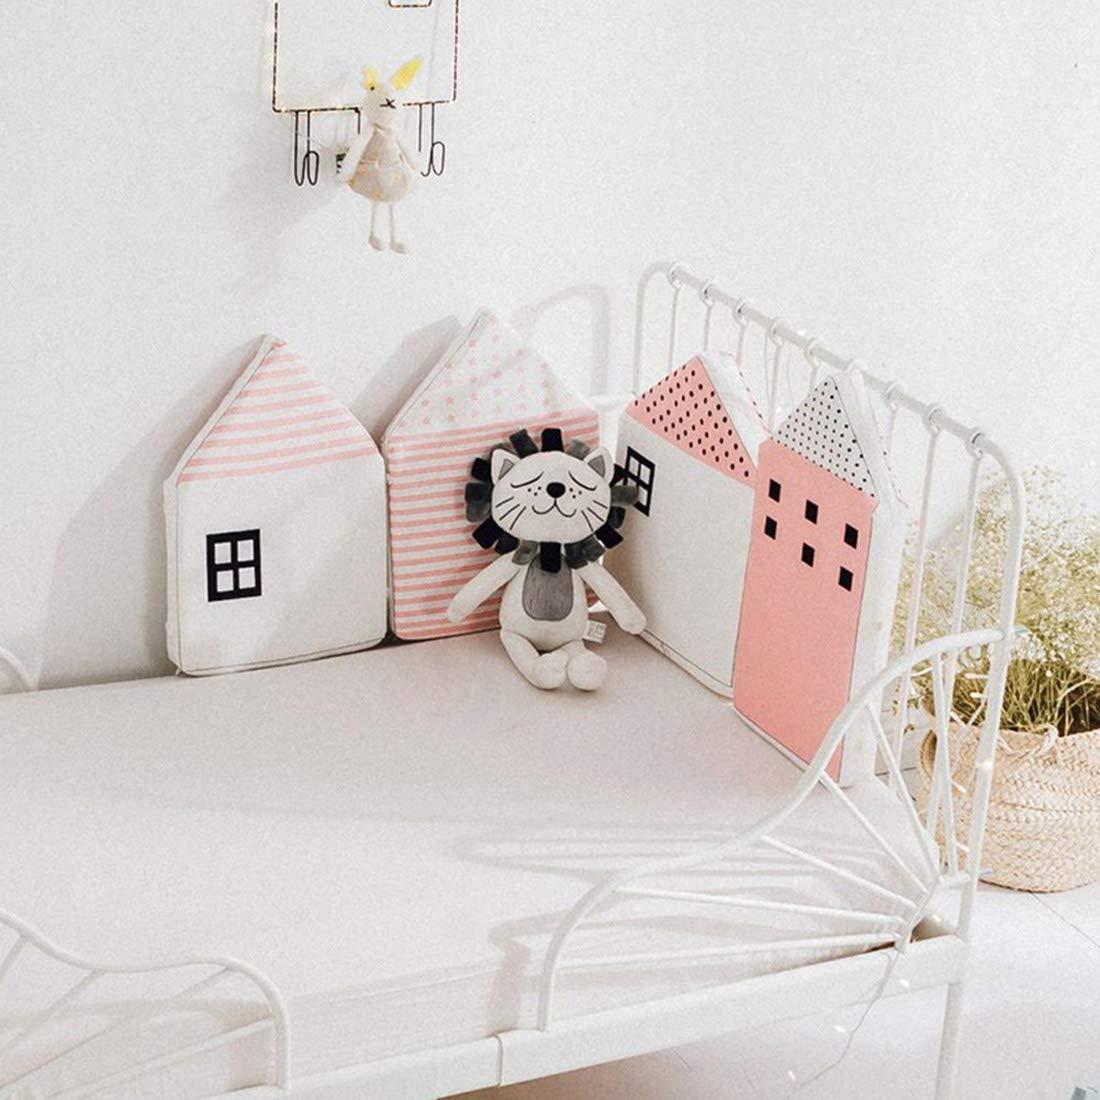 Jiyaru 4 Pieces Baby Crib Bumper Cotton Nursery Cradle Pads House Shape White